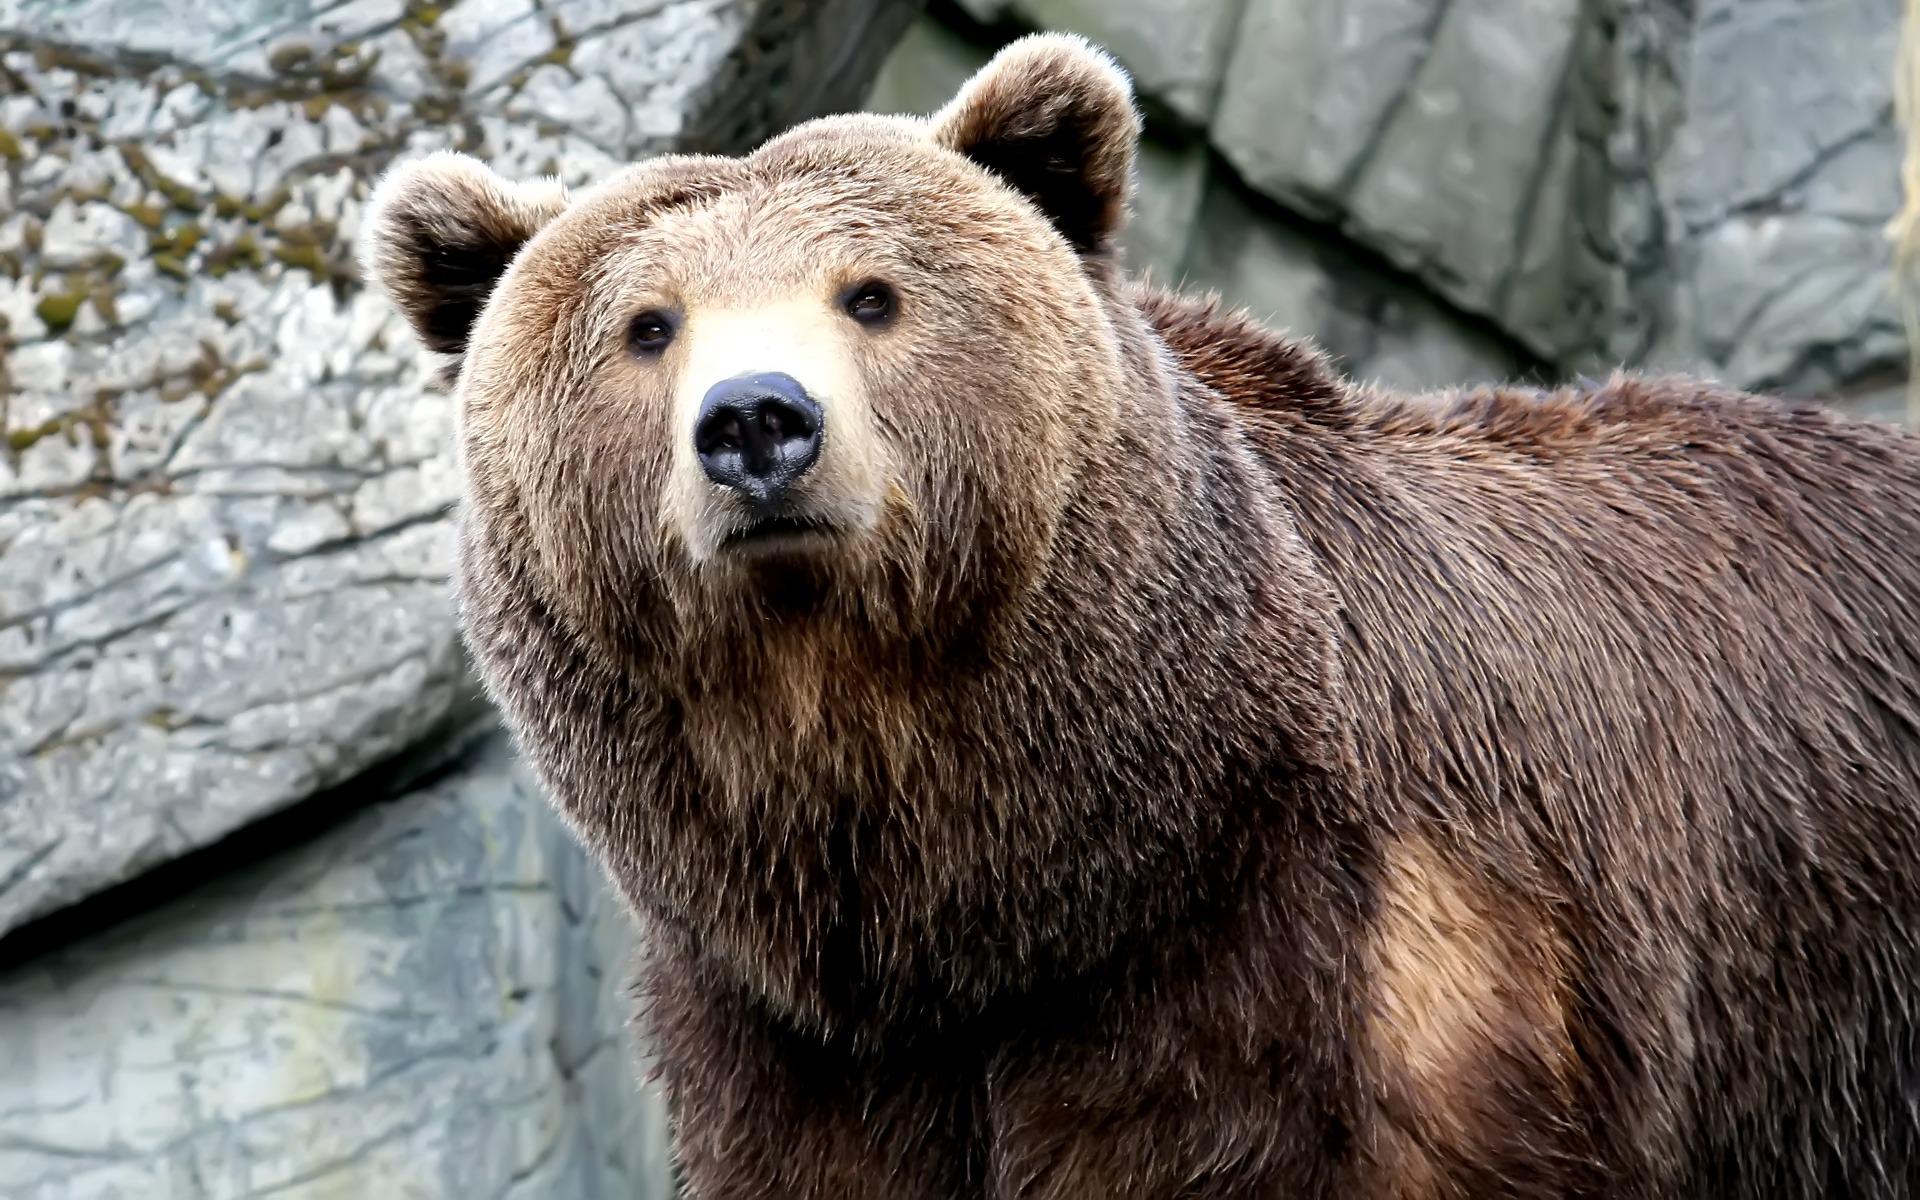 Wet Bear Wallpaper Bears Animals Wallpapers In Jpg Format For Free